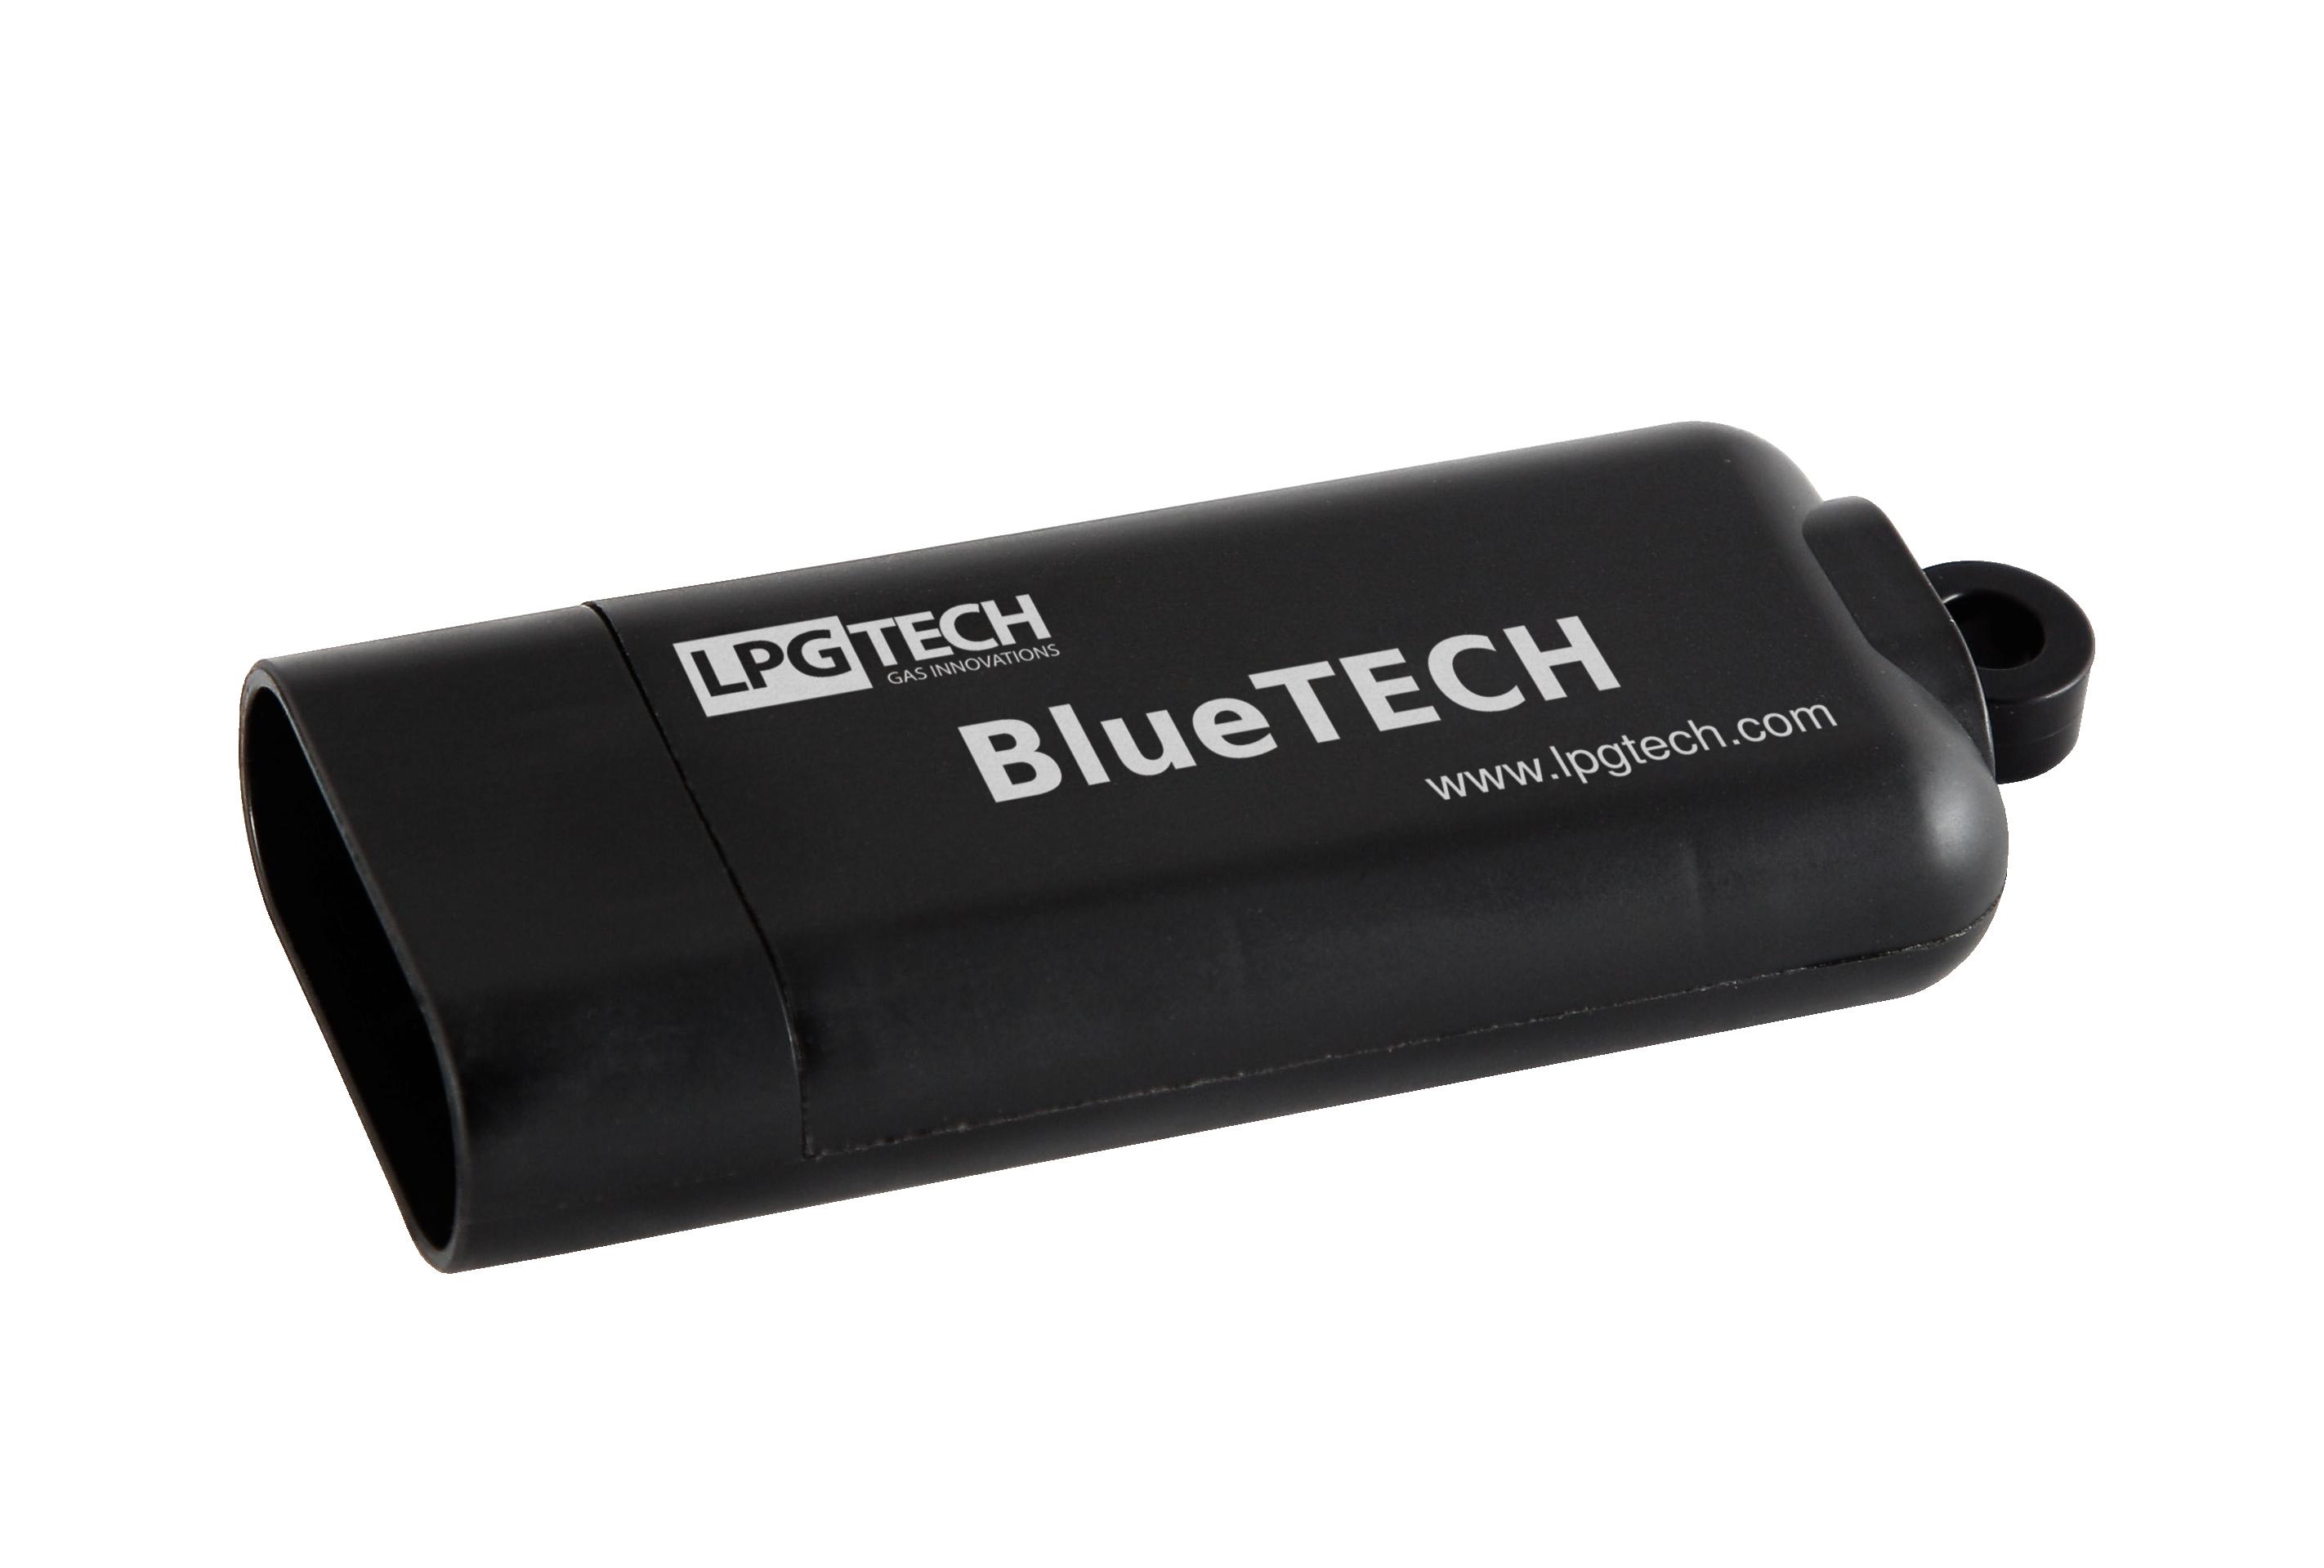 BlueTECH XT